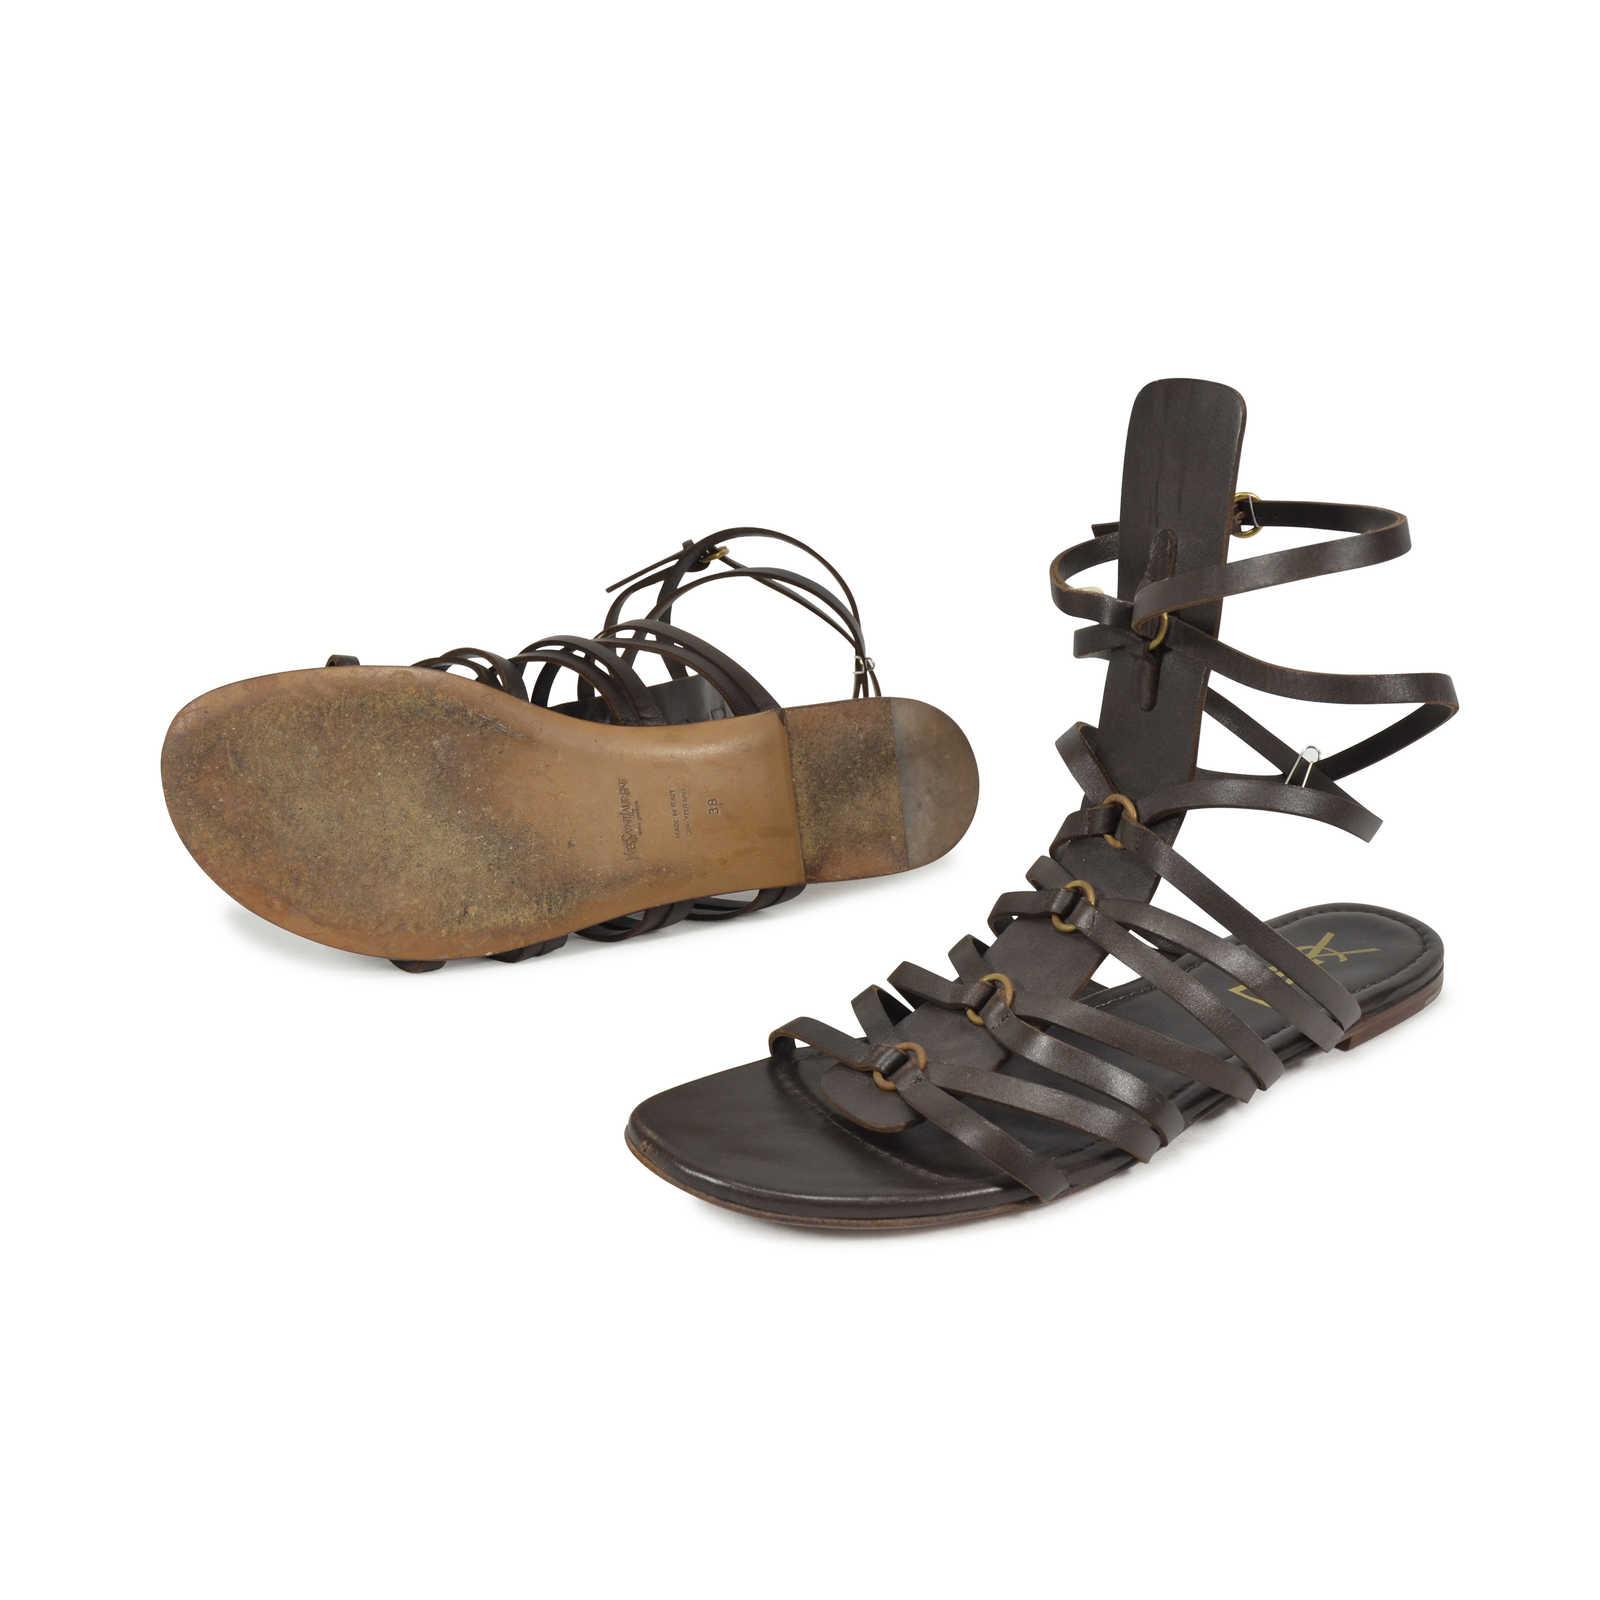 ce7a08365d1 ... Authentic Second Hand Yves Saint Laurent Goya Gladiator Sandals  (PSS-340-00009) ...